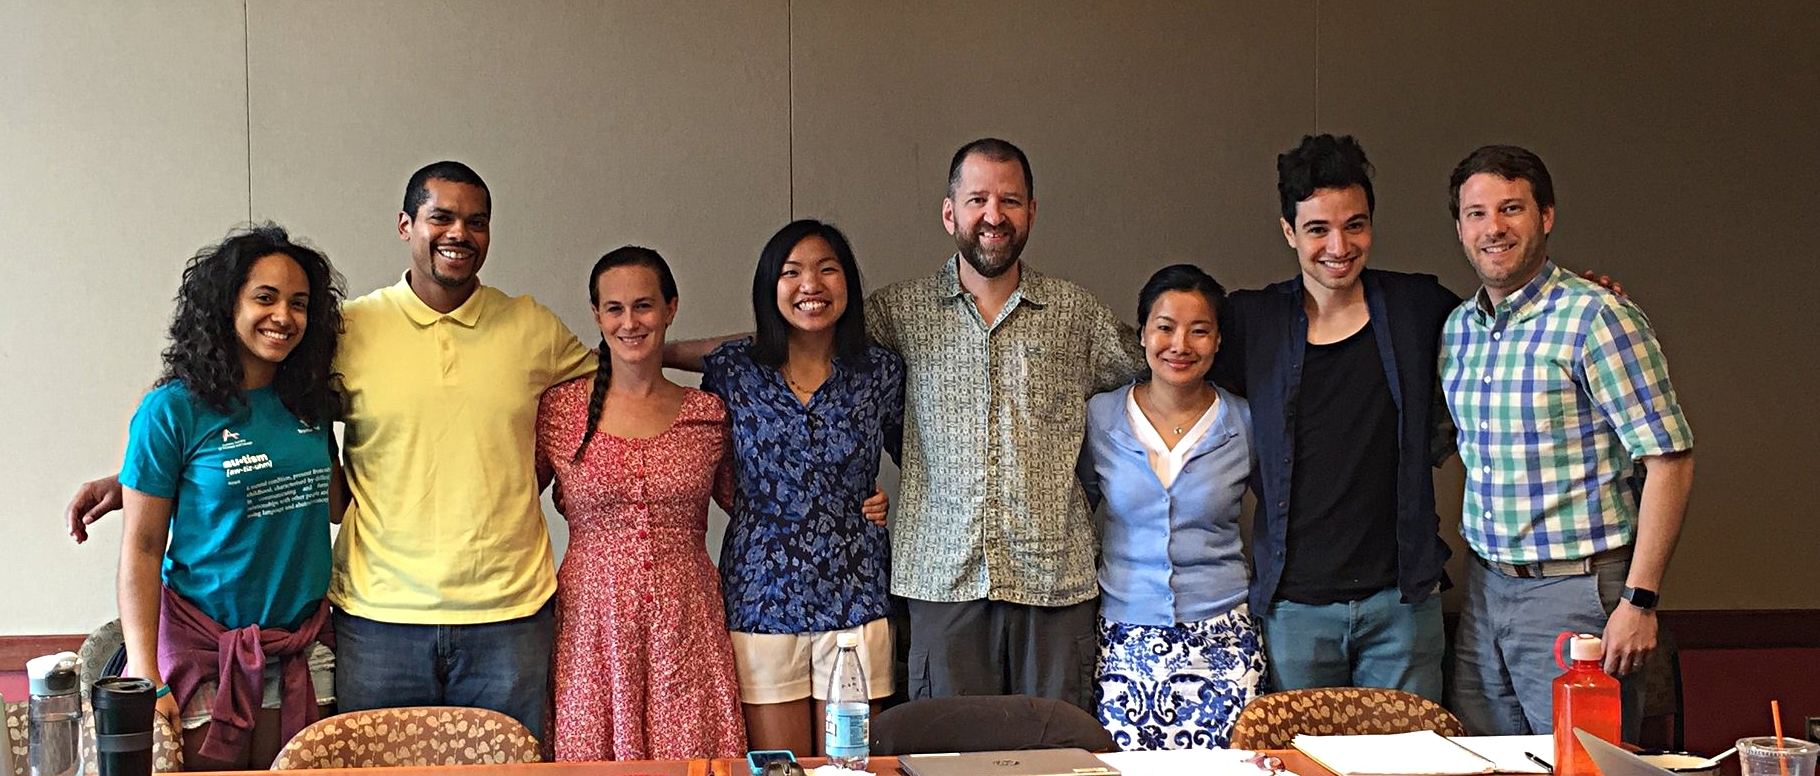 Weave News retreat, July 2016 from left to right: Michelle, Steve P., Jana, Nicole, John, Tsewang, Tzintzun, and Steve B.